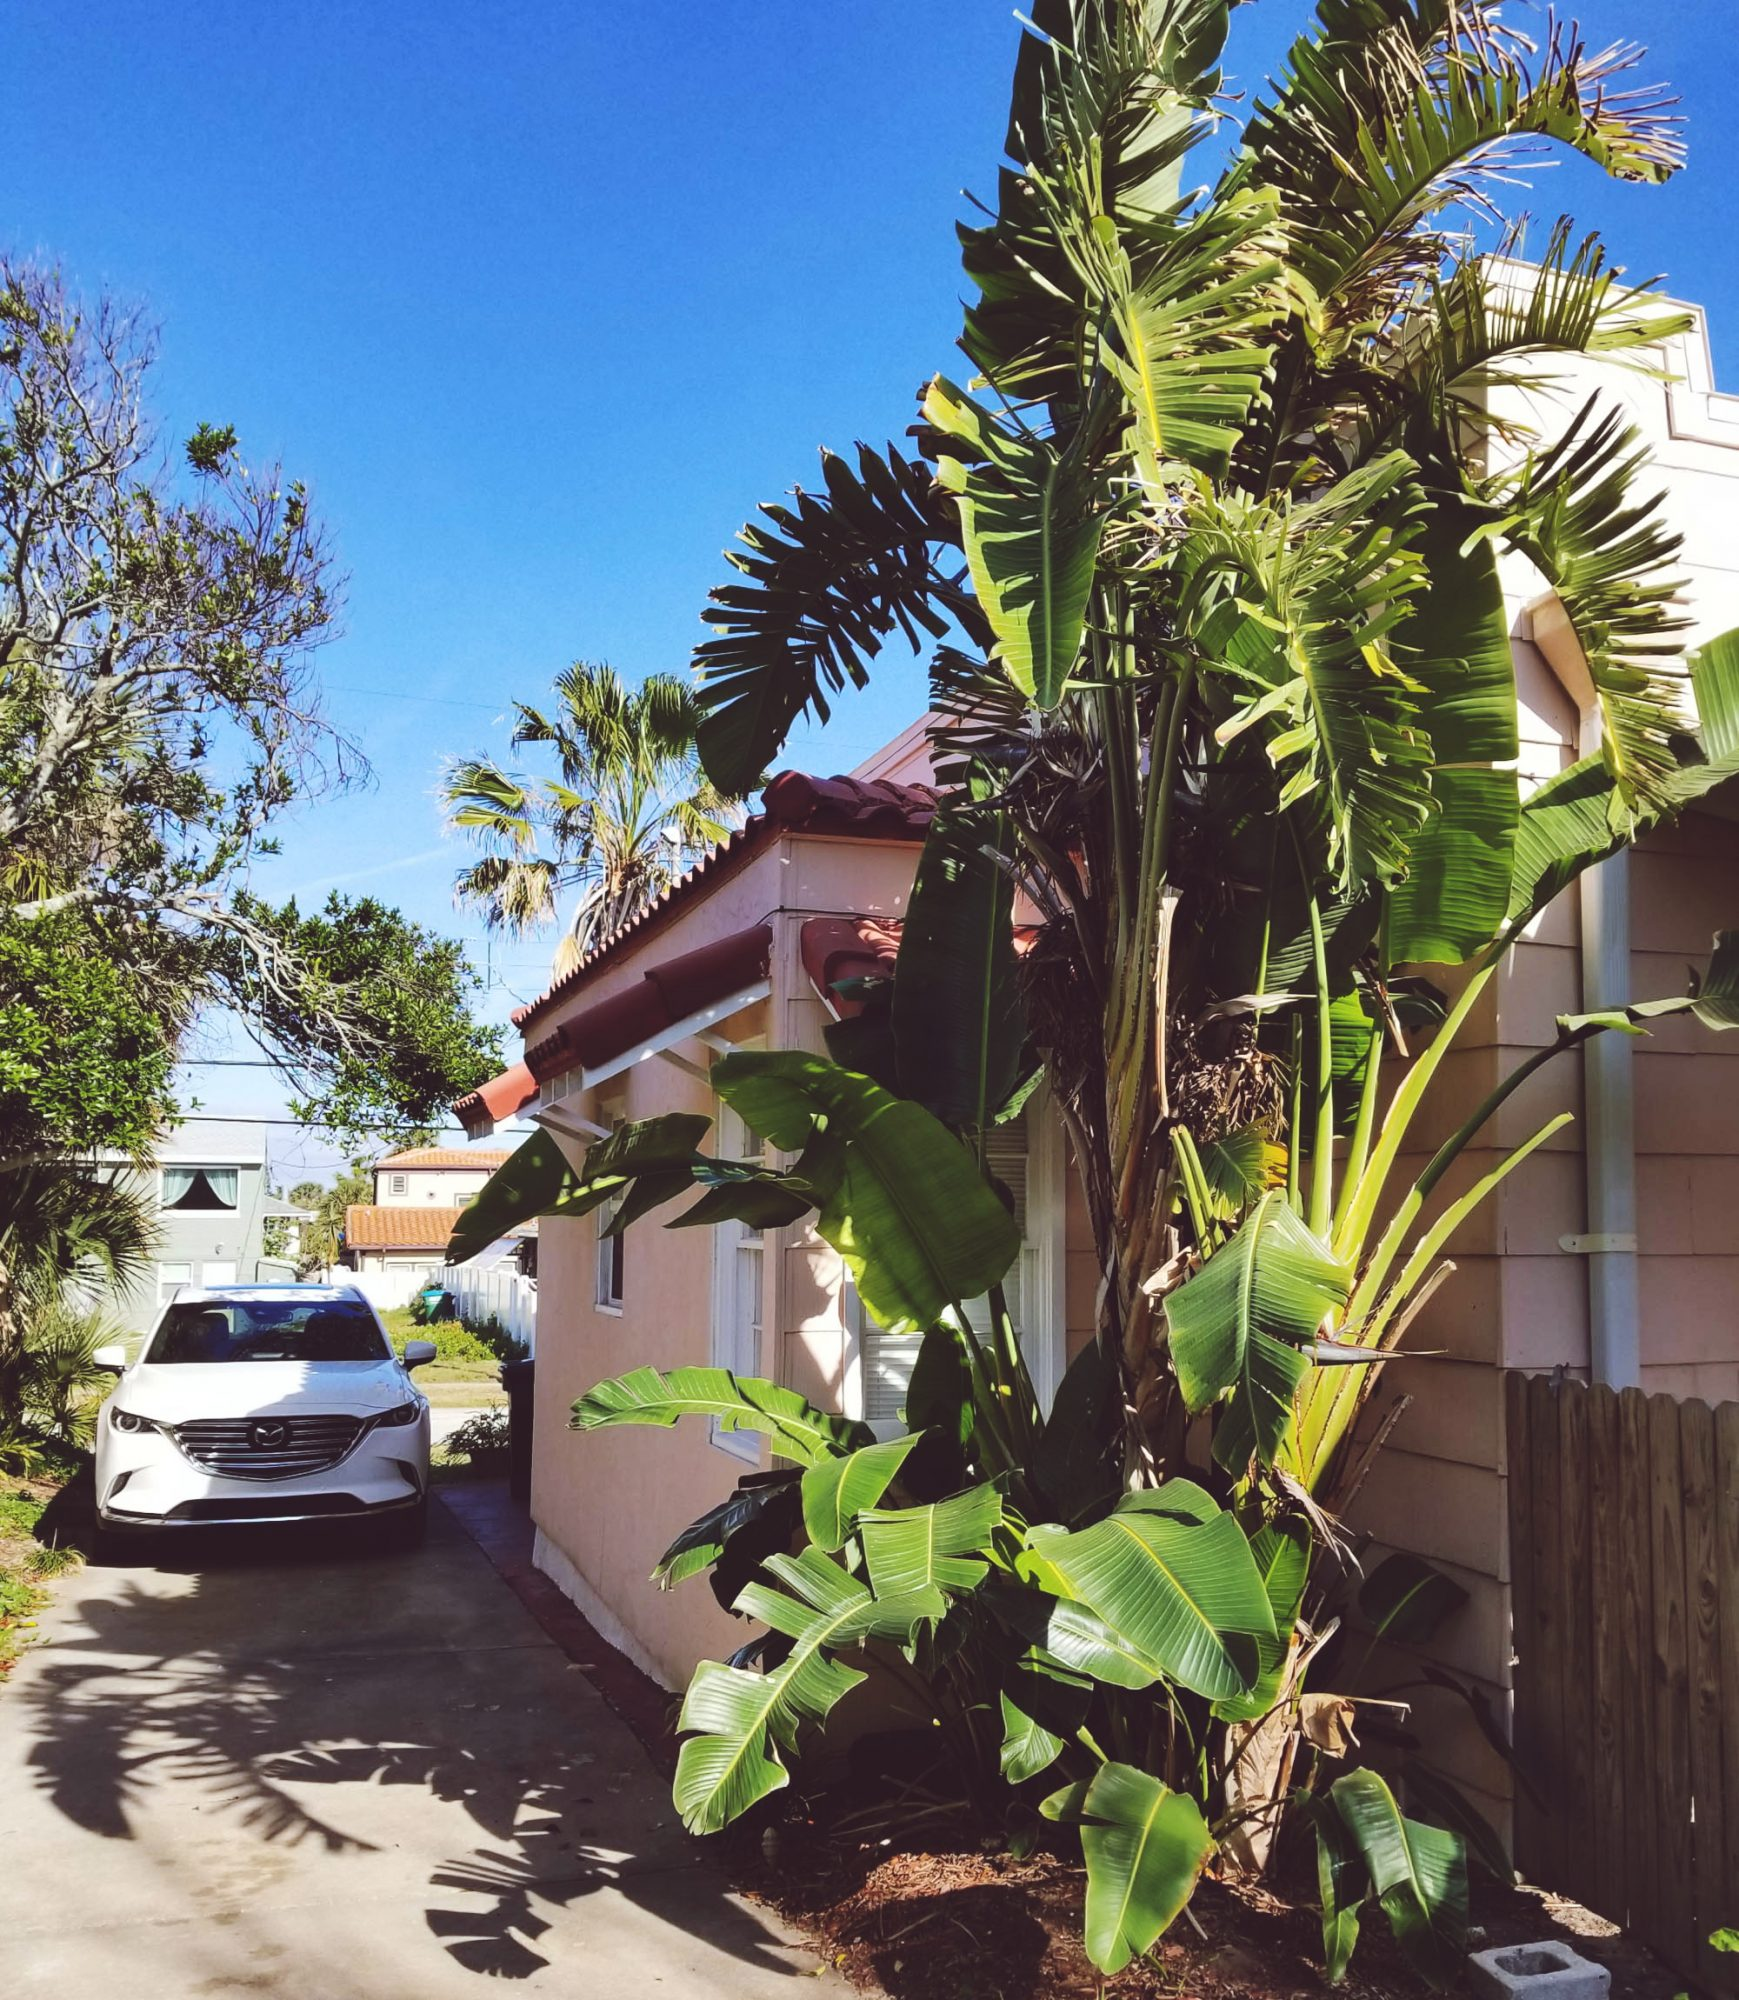 Boho Rustic Airbnb Florida Daytona